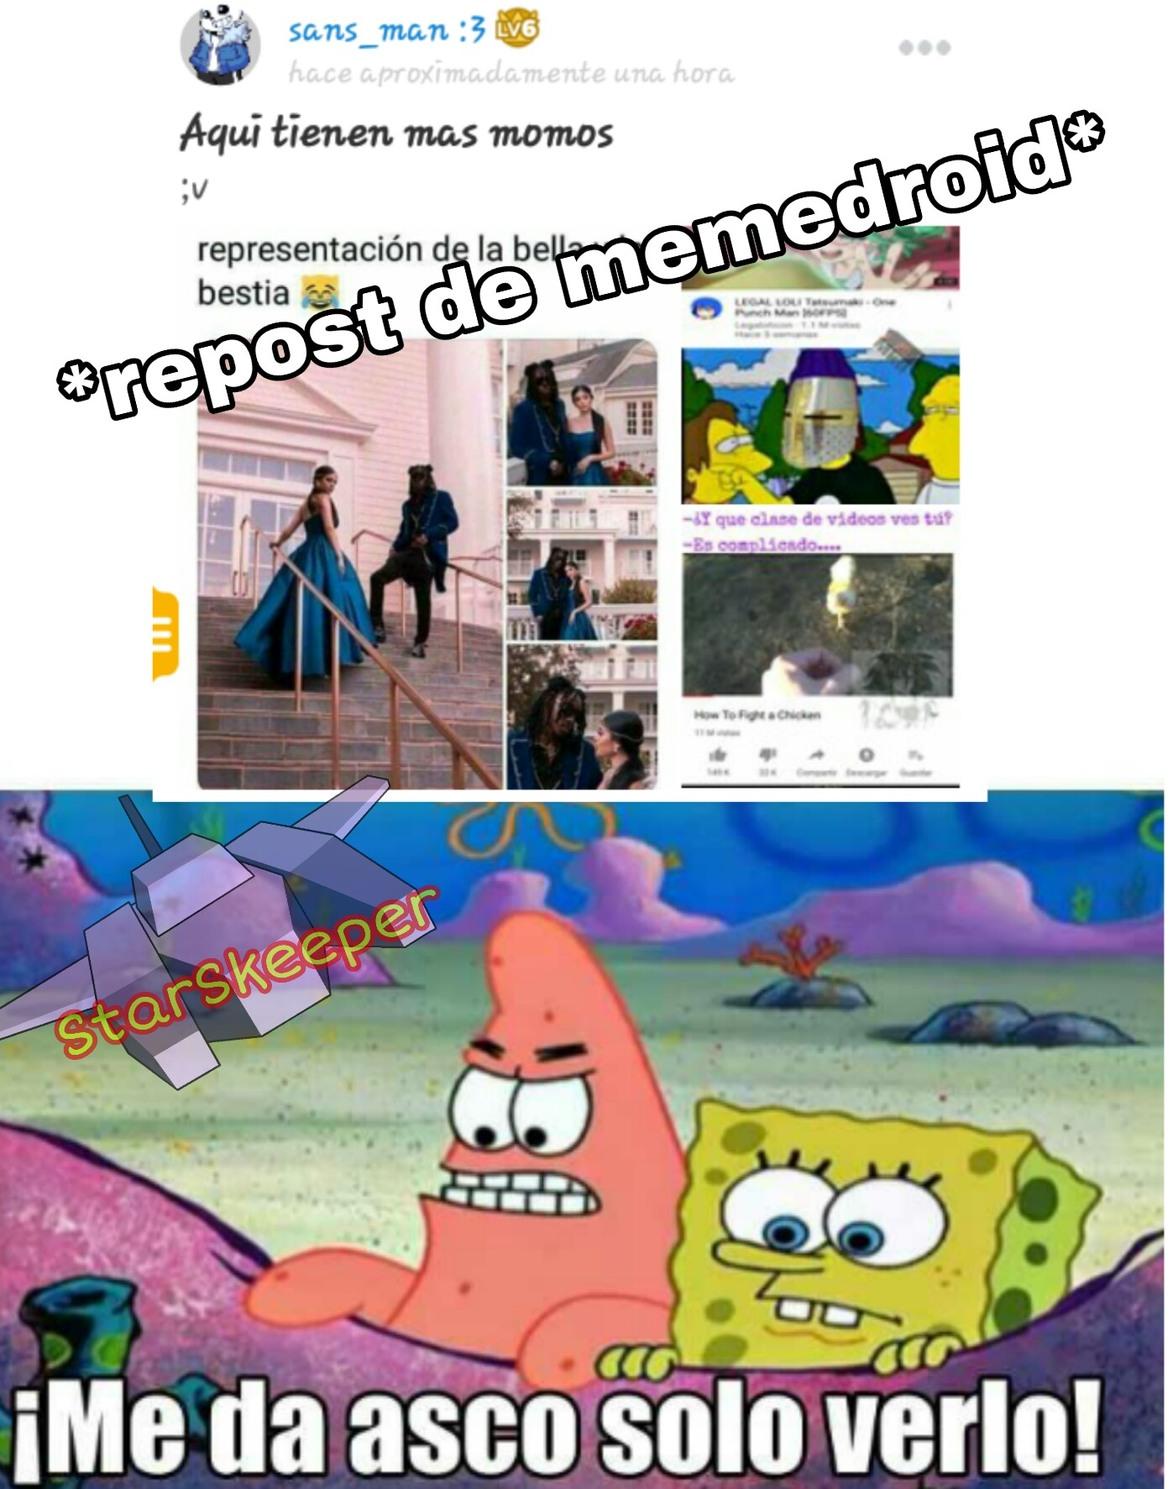 Al título le da asco el repost - meme